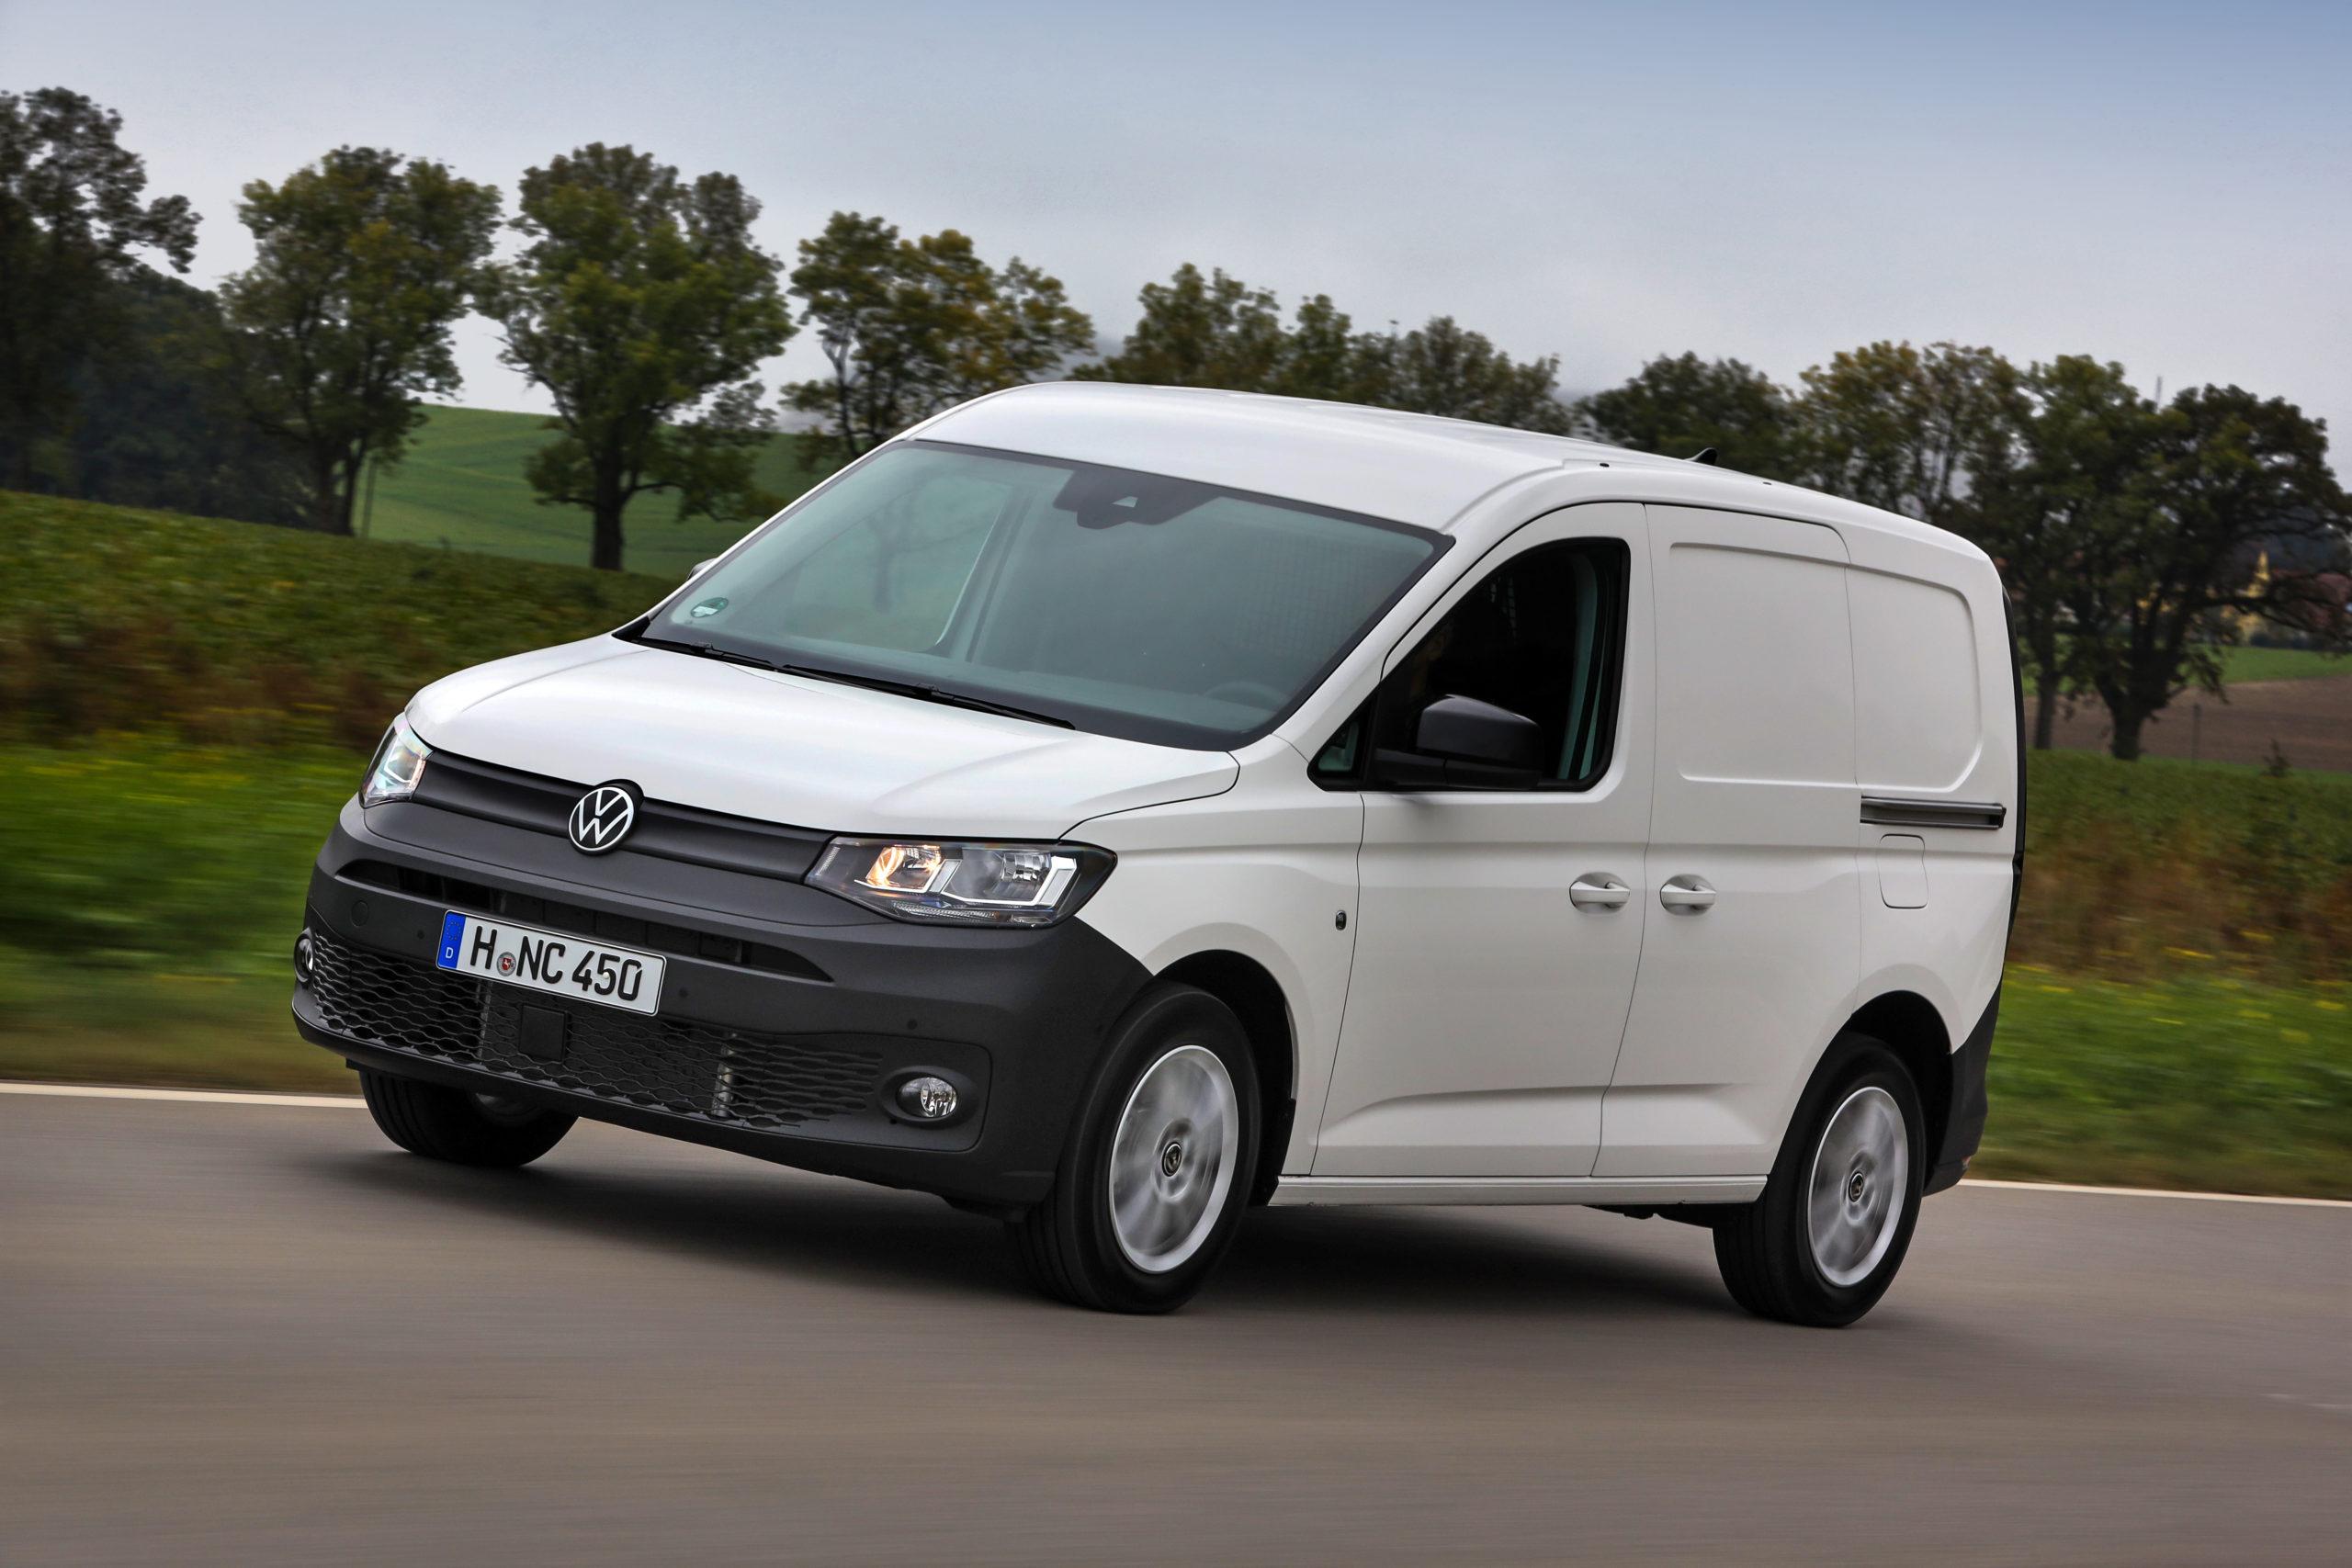 Top 5 Small Van Lease Options